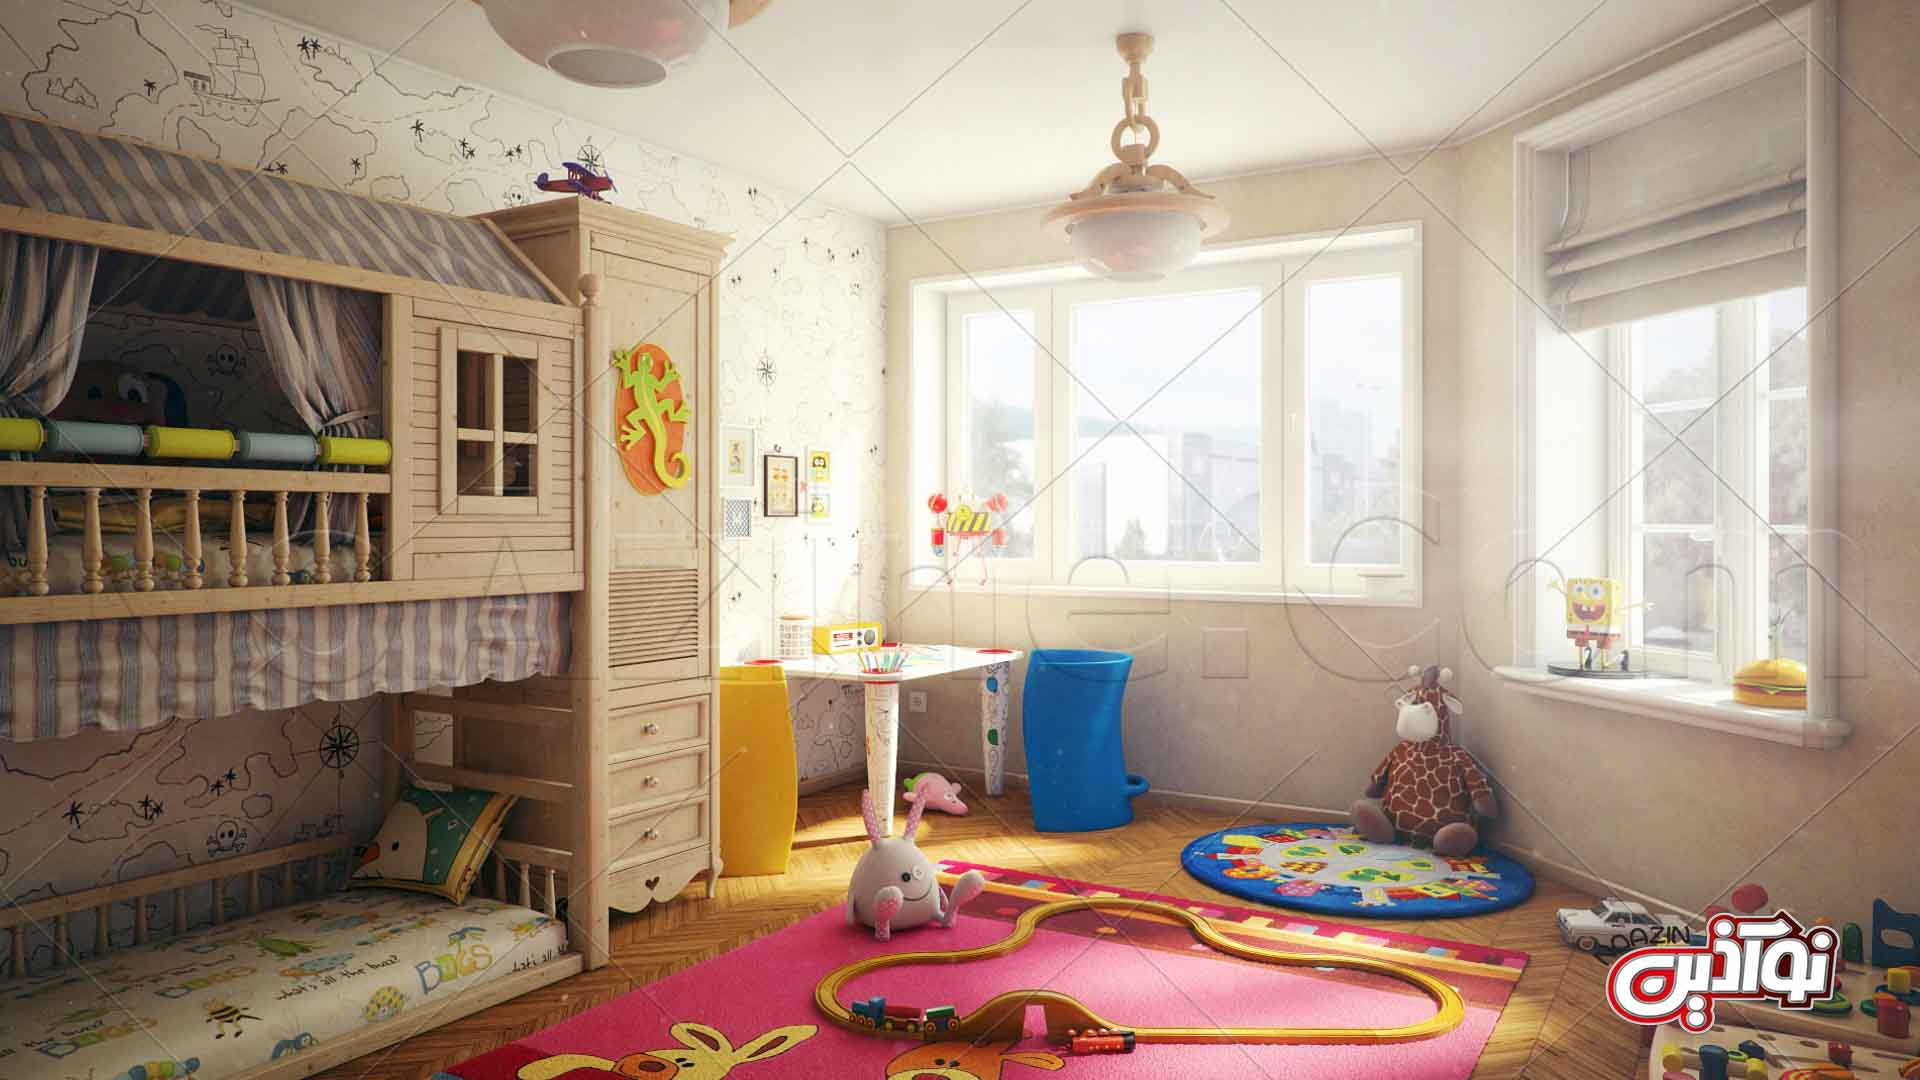 اتاق کودک, دکوراسیون اتاق کودک, دکوراسیون اتاق بچه, اتاق بچه, دکوراسیون اتاق, طرح کودک, رنگ اتاق کودک, طراحی اتاق کودک, طراحی اتاق, طراحی کودک, طرح اتاق کودک, طراحی اتاق بچه, اتاق نوزاد, طراحی اتاق نوزاد, دکوراسیون اتاق نوزاد, طرح اتاق نوزاد, طراحی اتاق کودکان, اتاق کودکان,